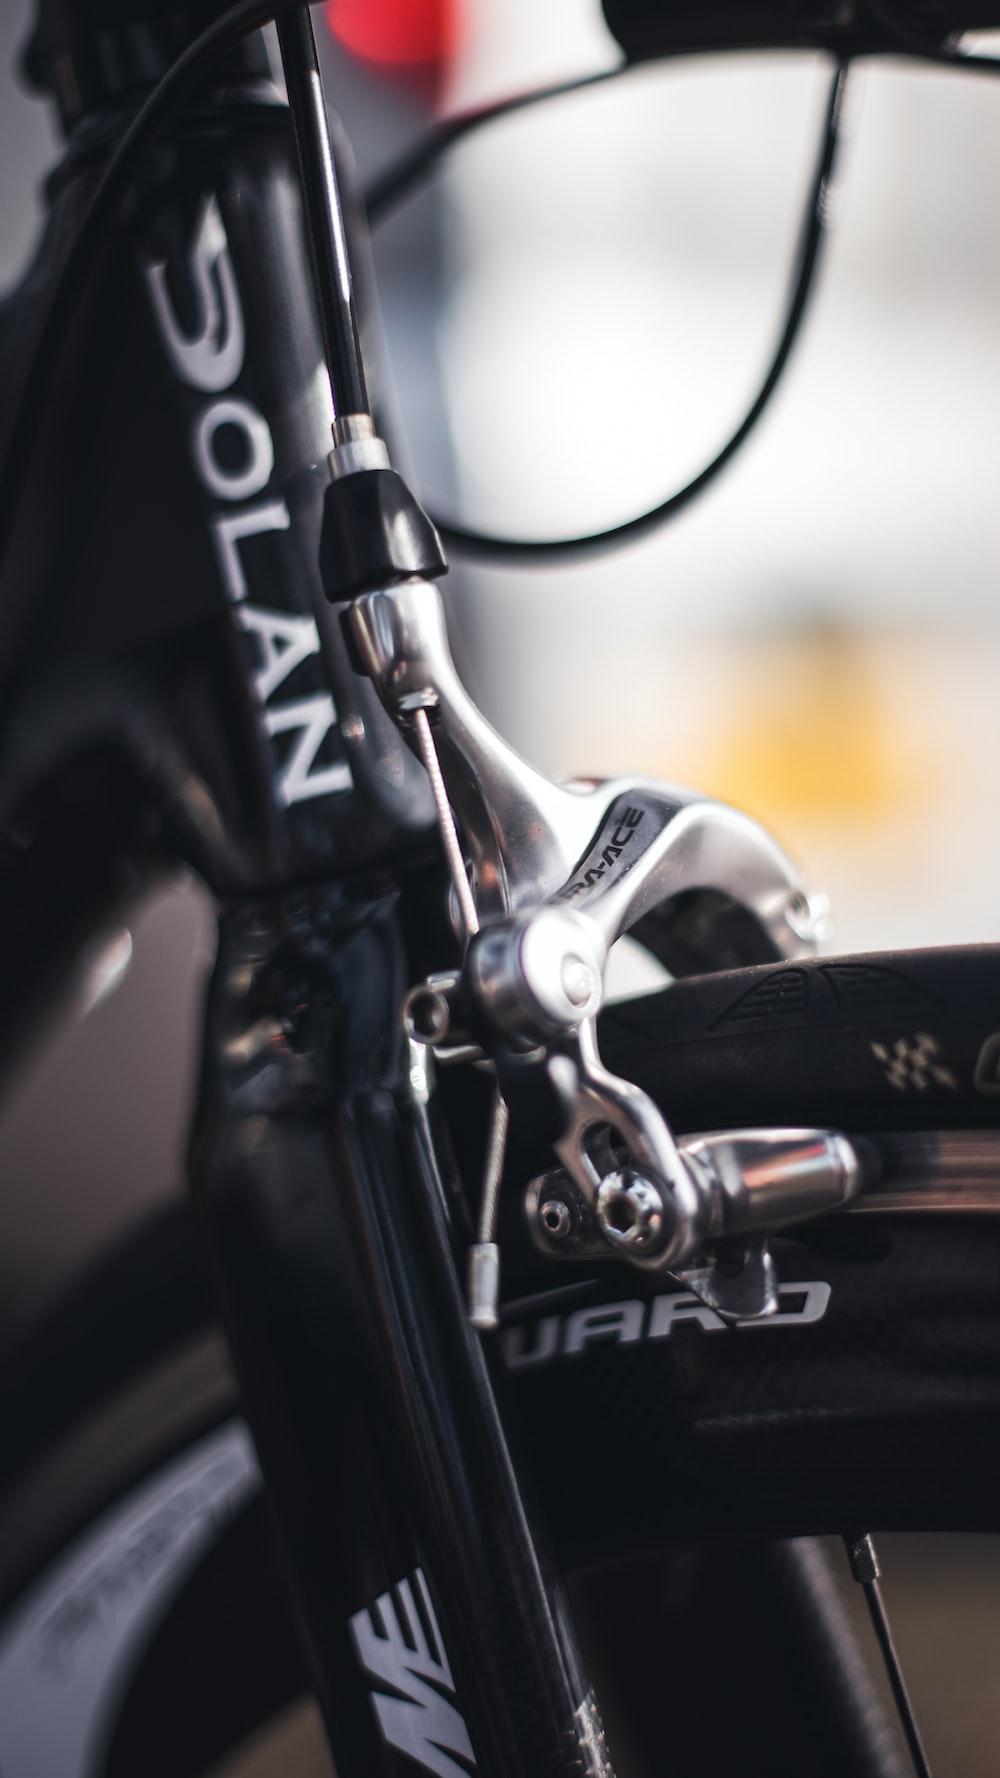 black and white Dolan bike